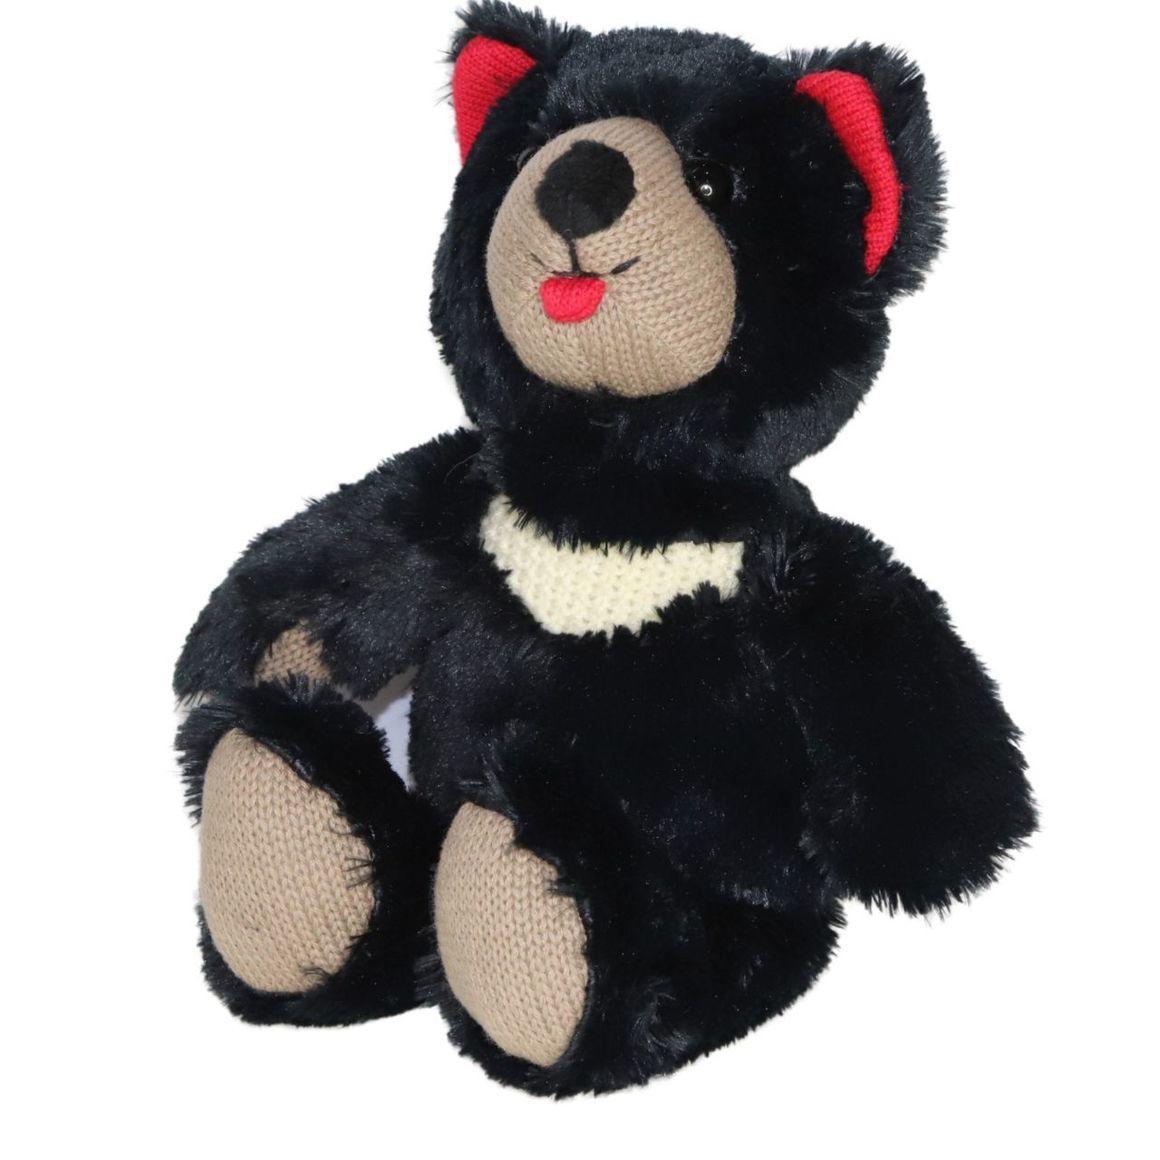 Plush Toy Tassie Devil - Black/Red    Trada Marketplace